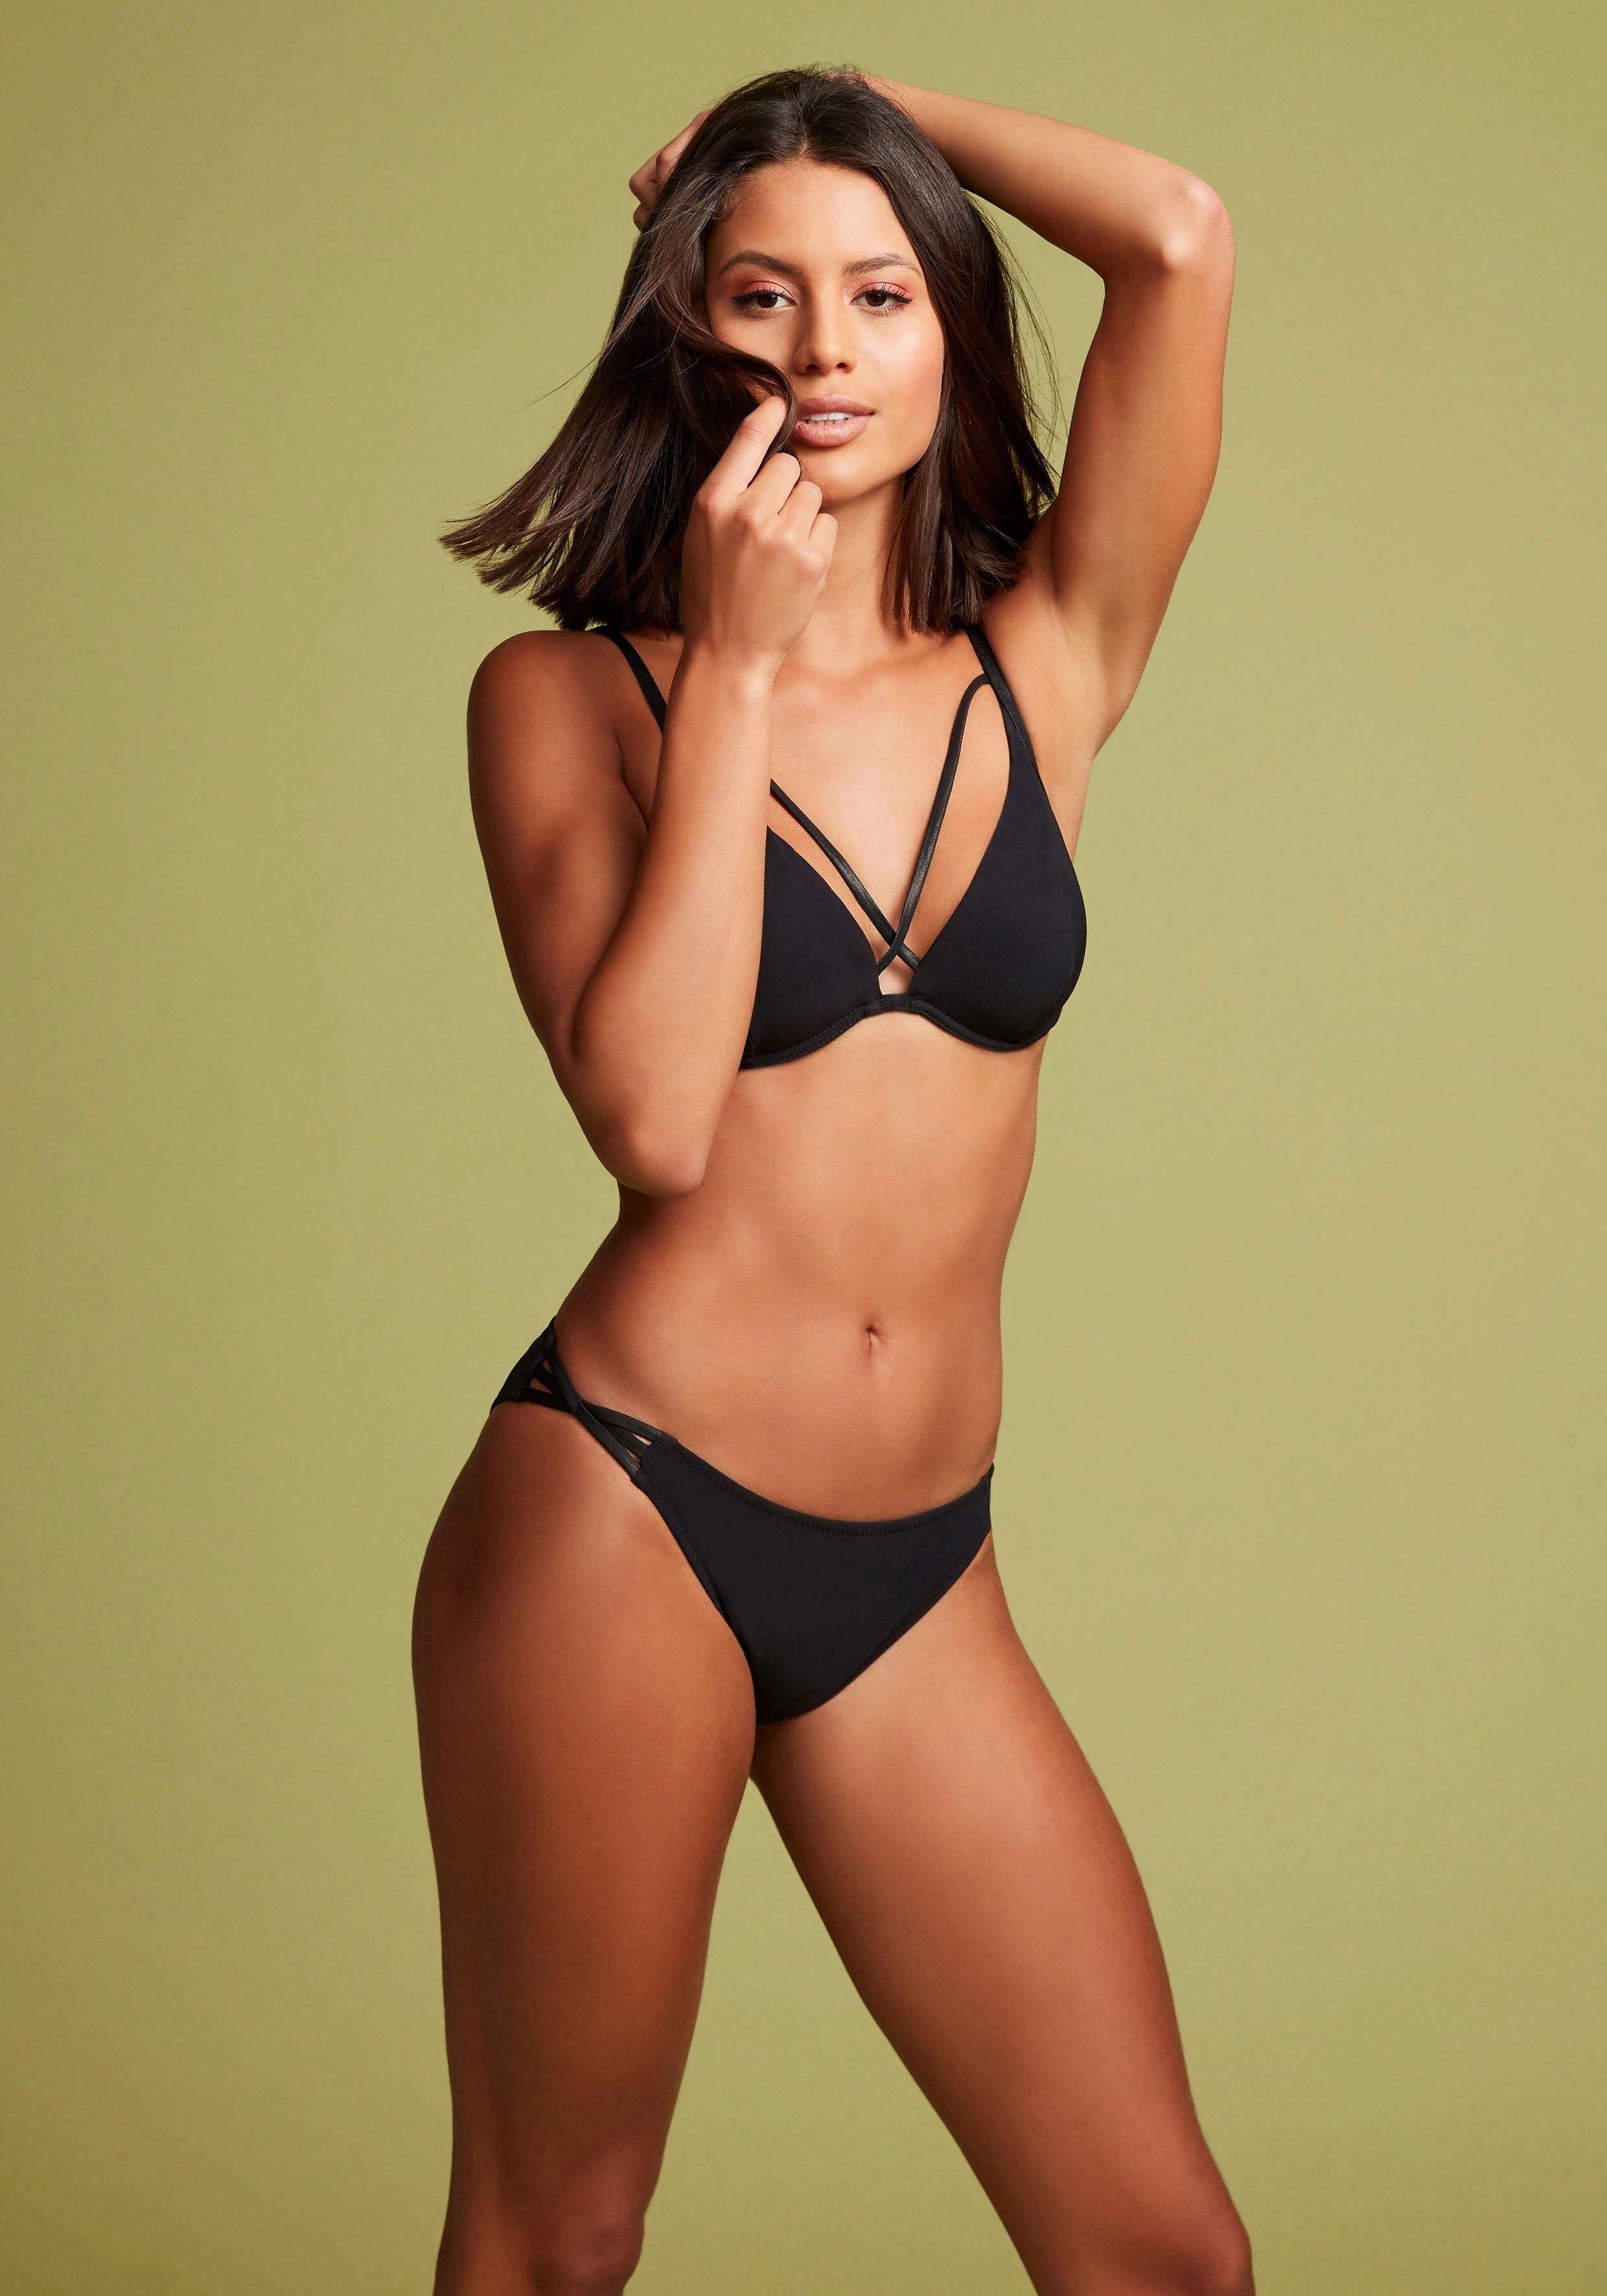 Lascana bikinibroekje Scarlett met smalle bandjes opzij voordelig en veilig online kopen